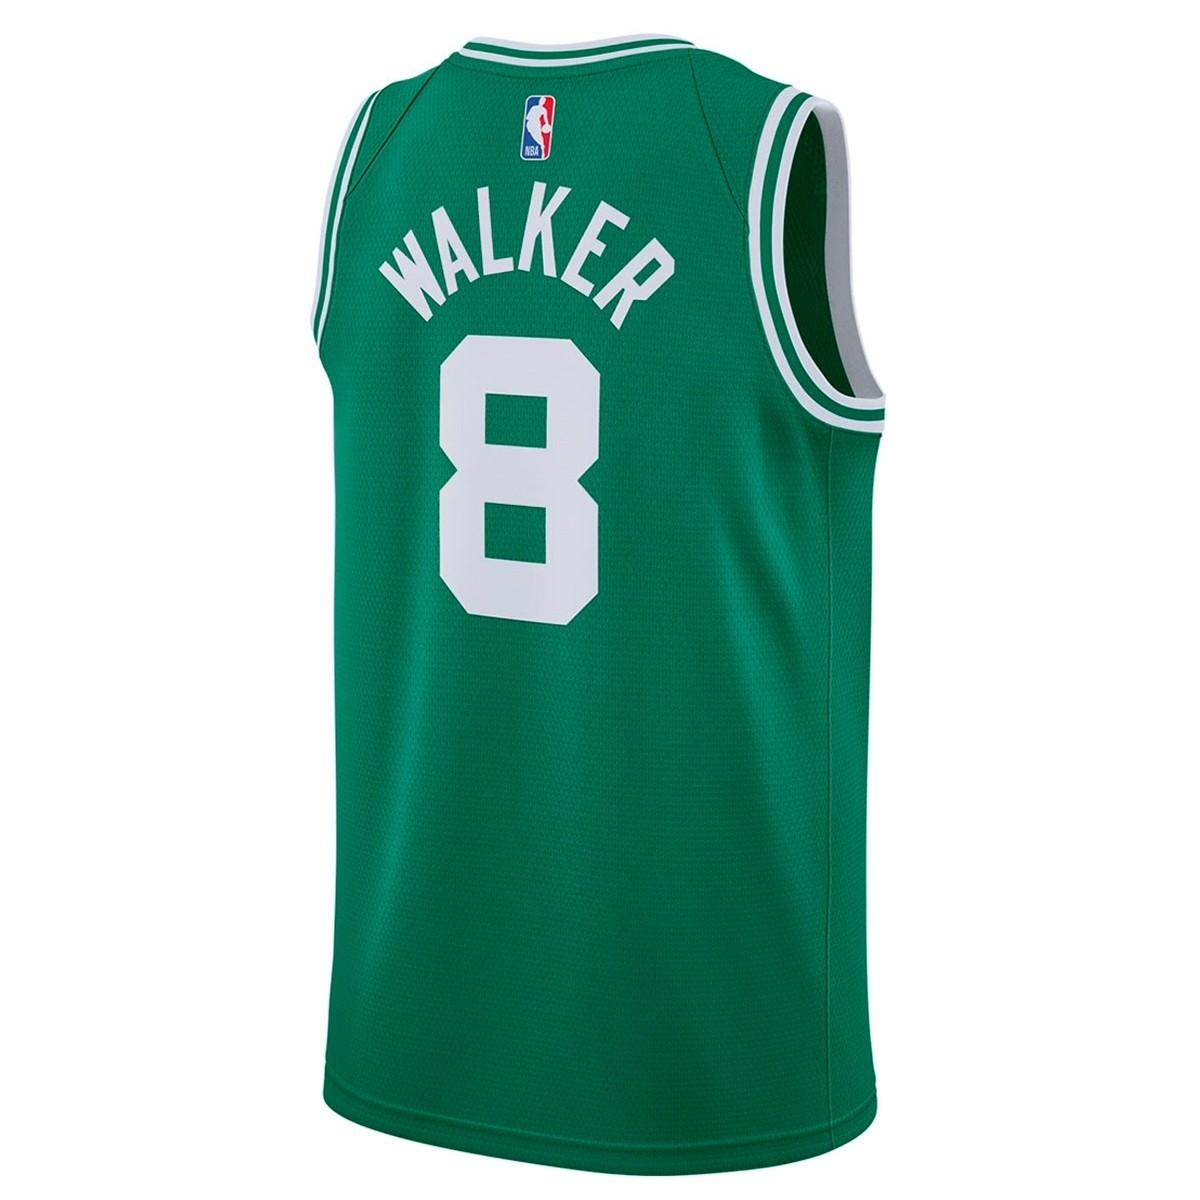 Nike Junior NBA Celtics Swingman Jersey Walker 'Icon Edition'-EZ2B7BZ2P-BCKWI